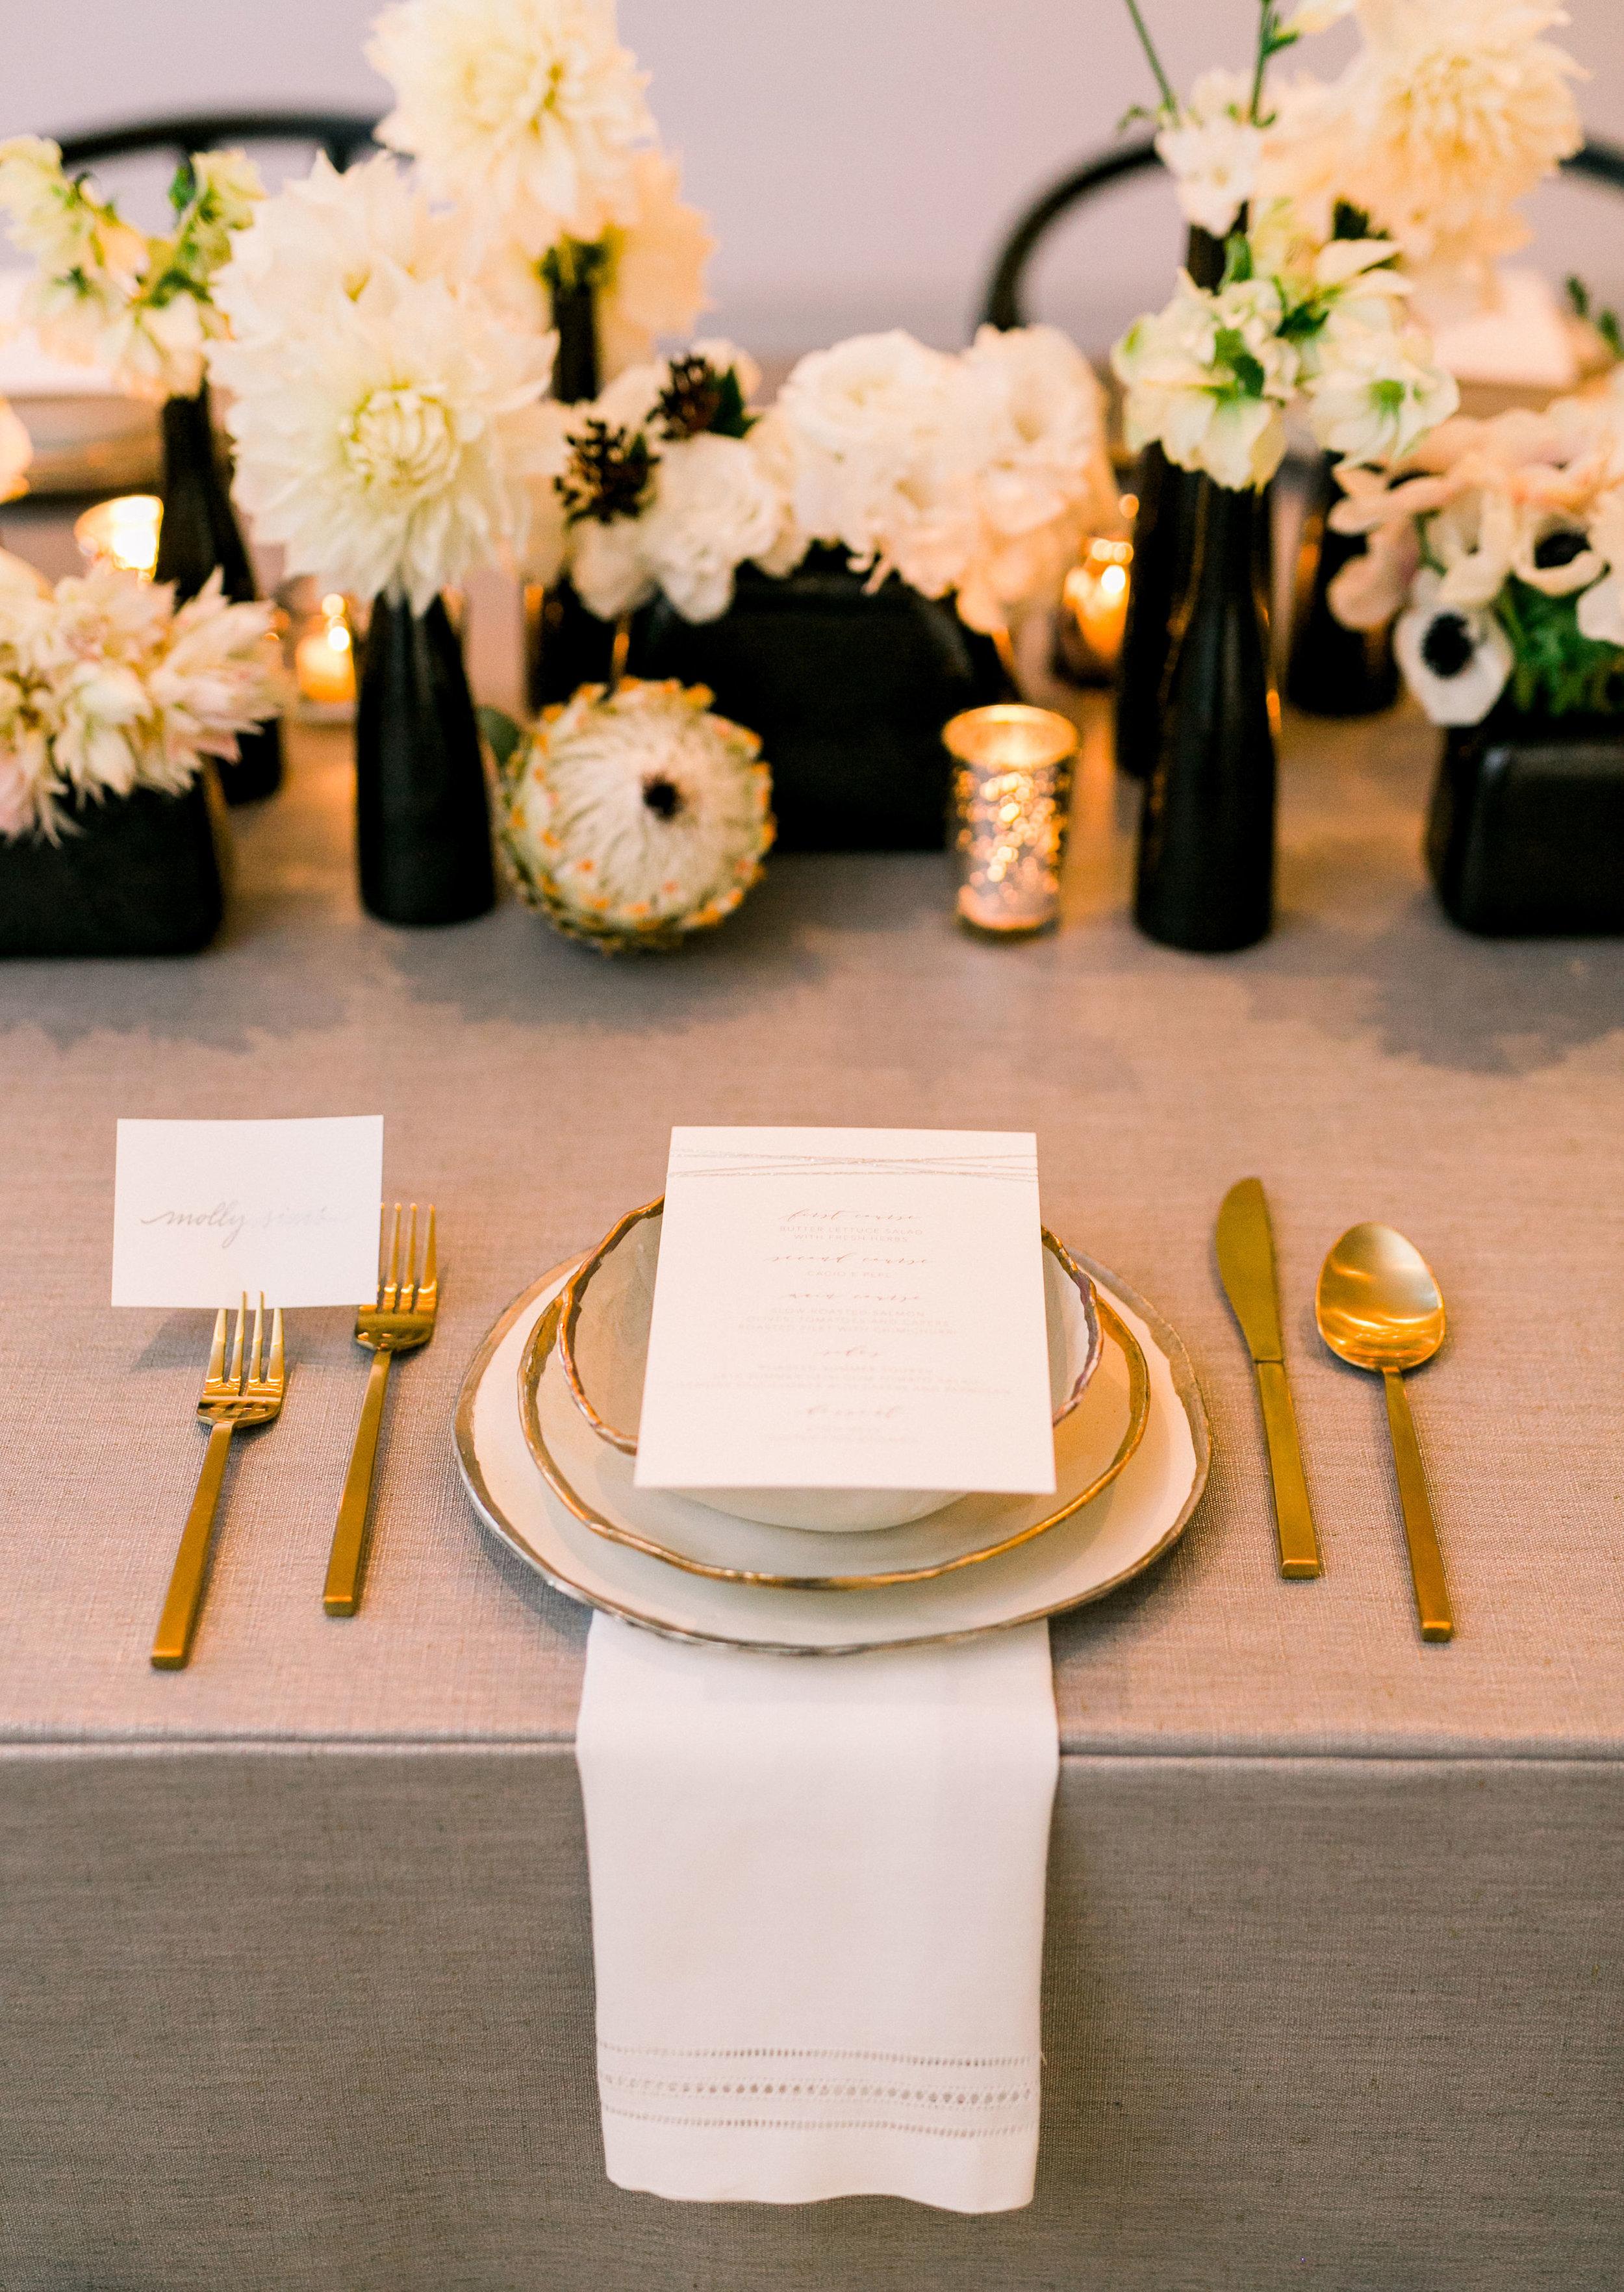 How To Create A Festive Winter Tablescape (Photography: Smith house Photos)